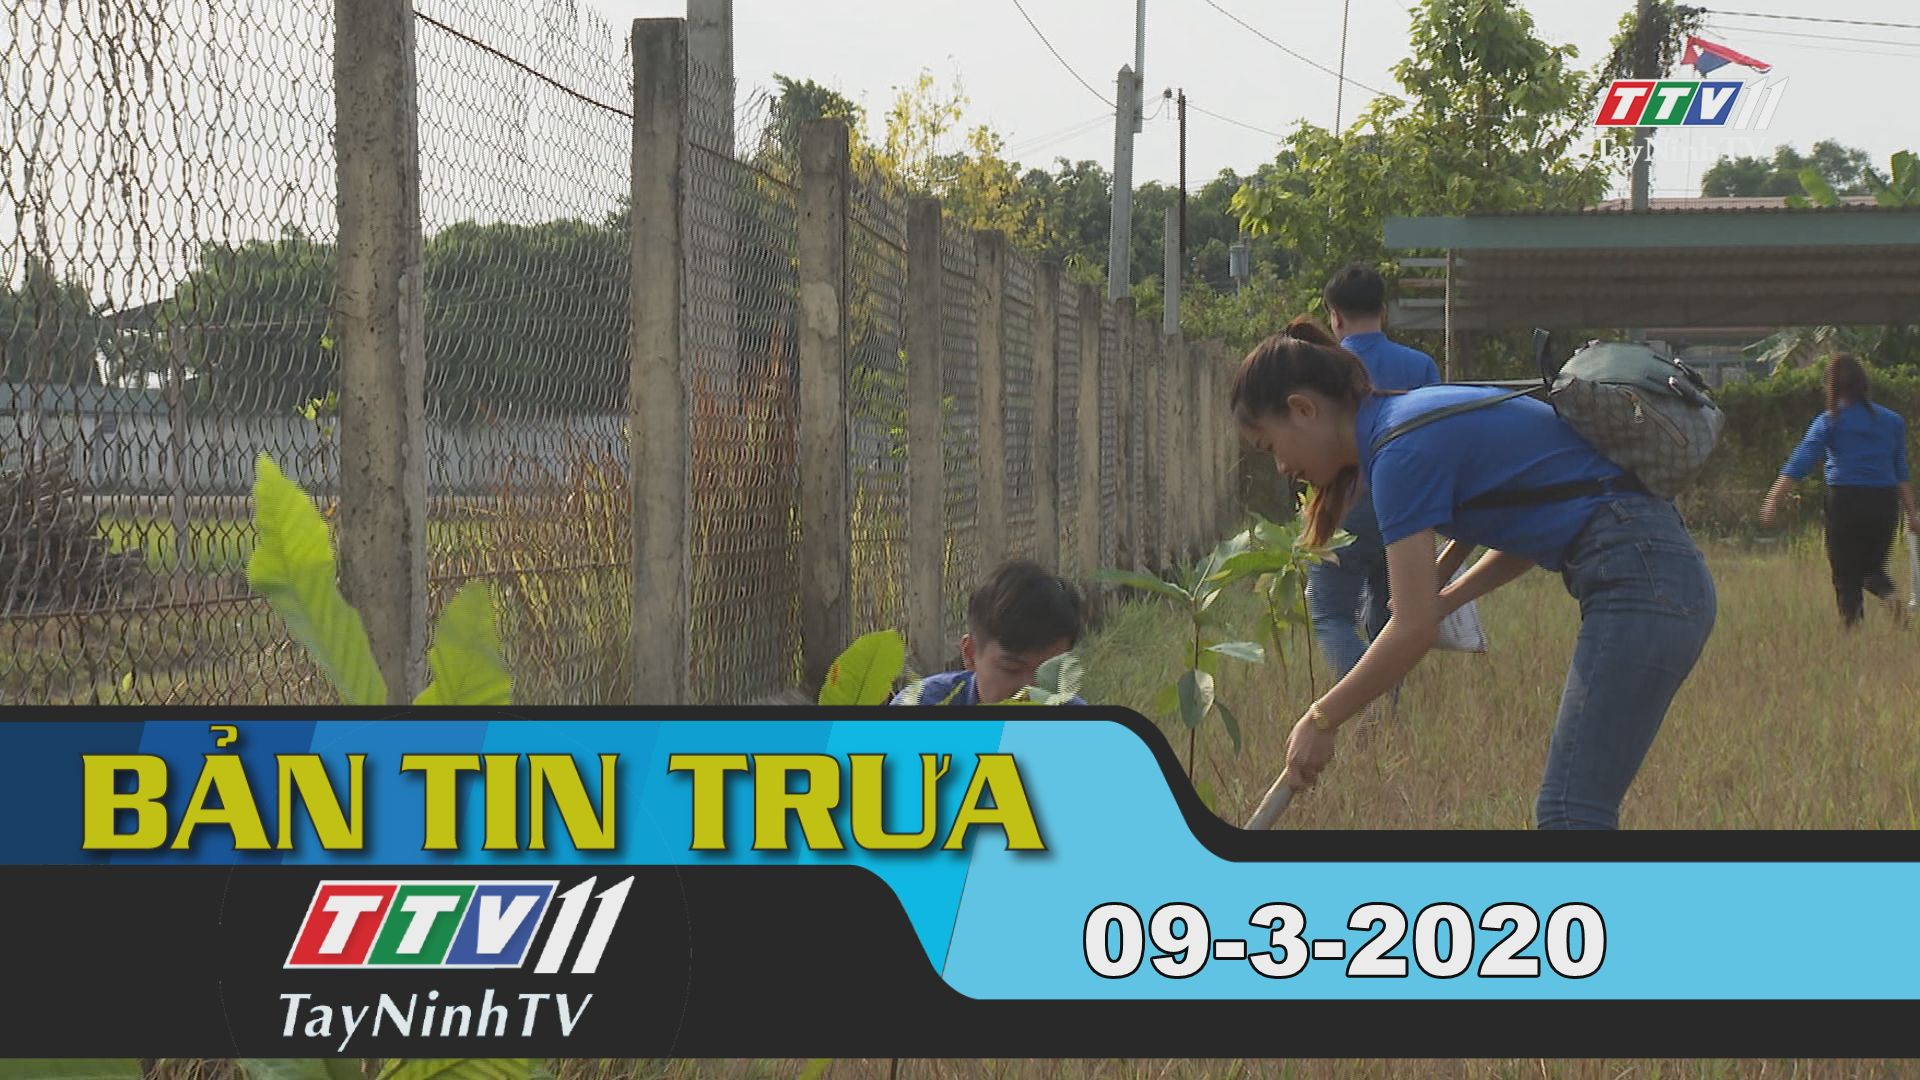 Bản tin trưa 09-3-2020 | Tin tức hôm nay | TayNinhTV